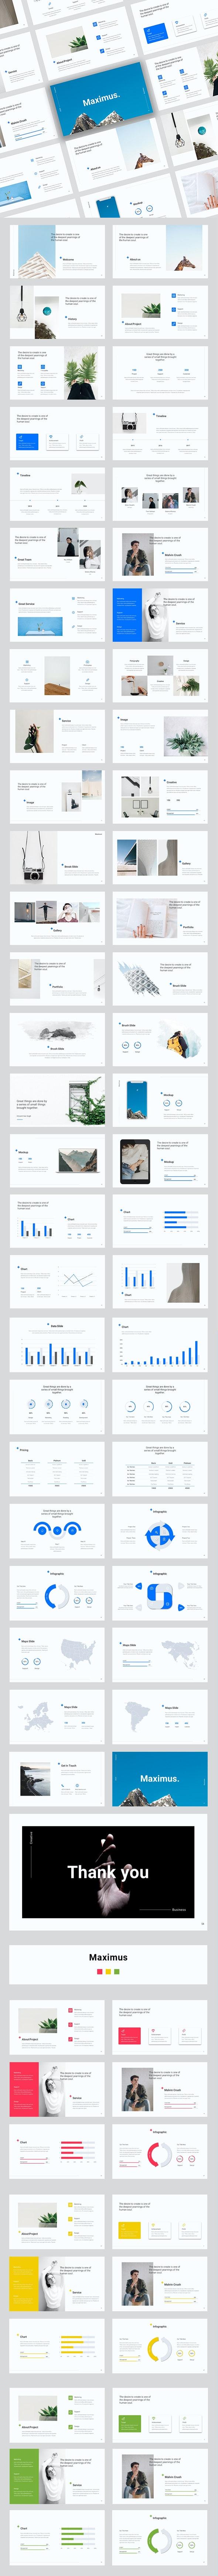 Maximus - Creative Bussines Google Slide Template - Google Slides Presentation Templates